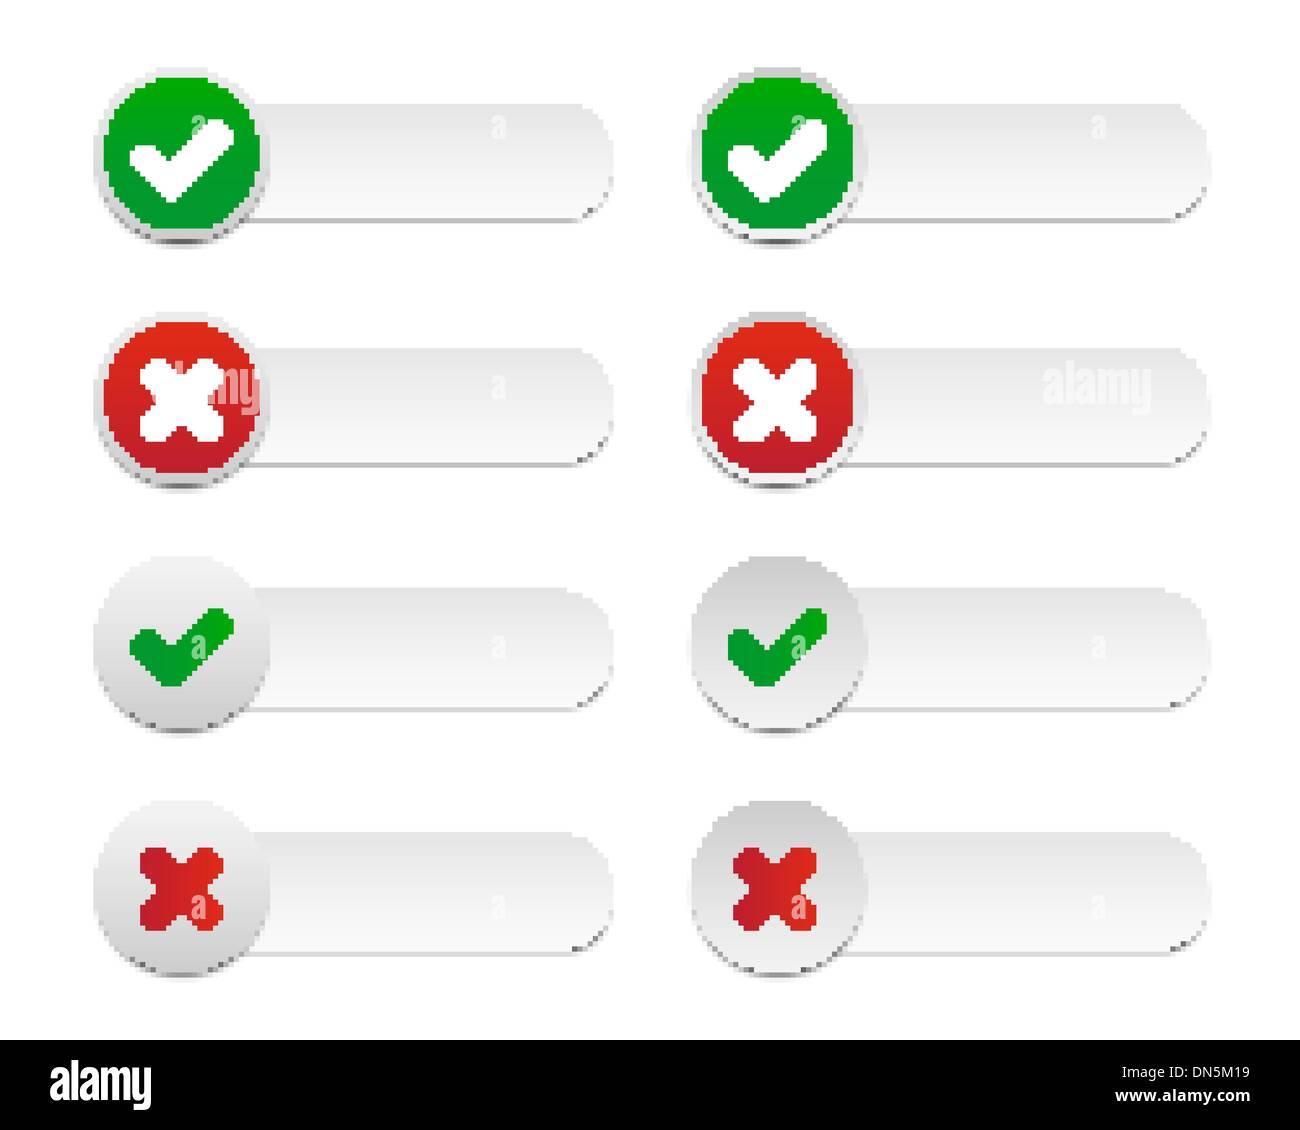 Validation labels - Stock Image